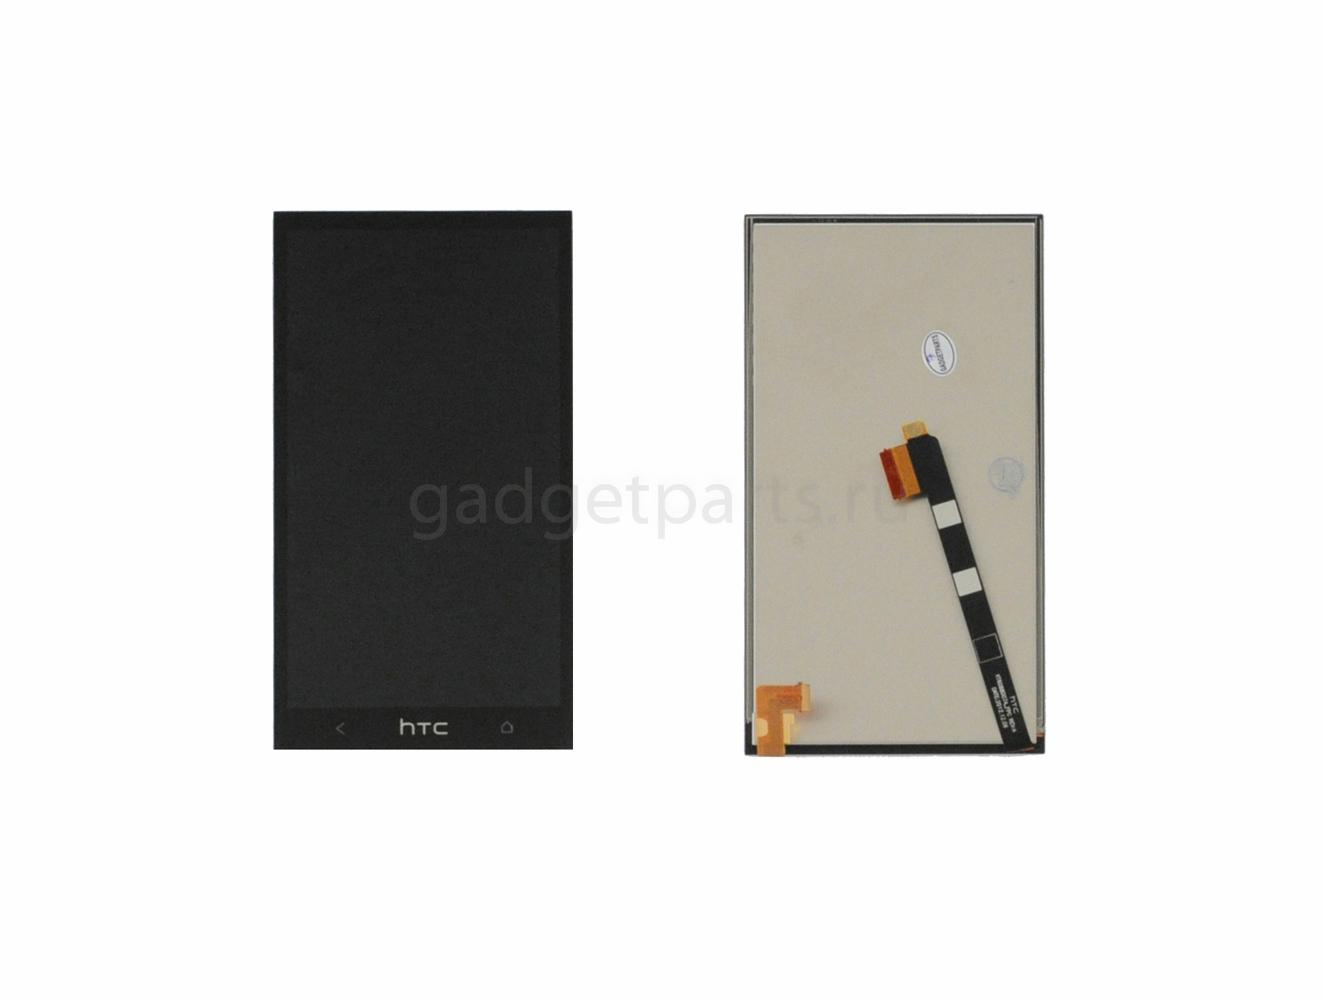 Модуль (дисплей, тачскрин) HTC ONE M7, 801e Черный (Black) Оригинал